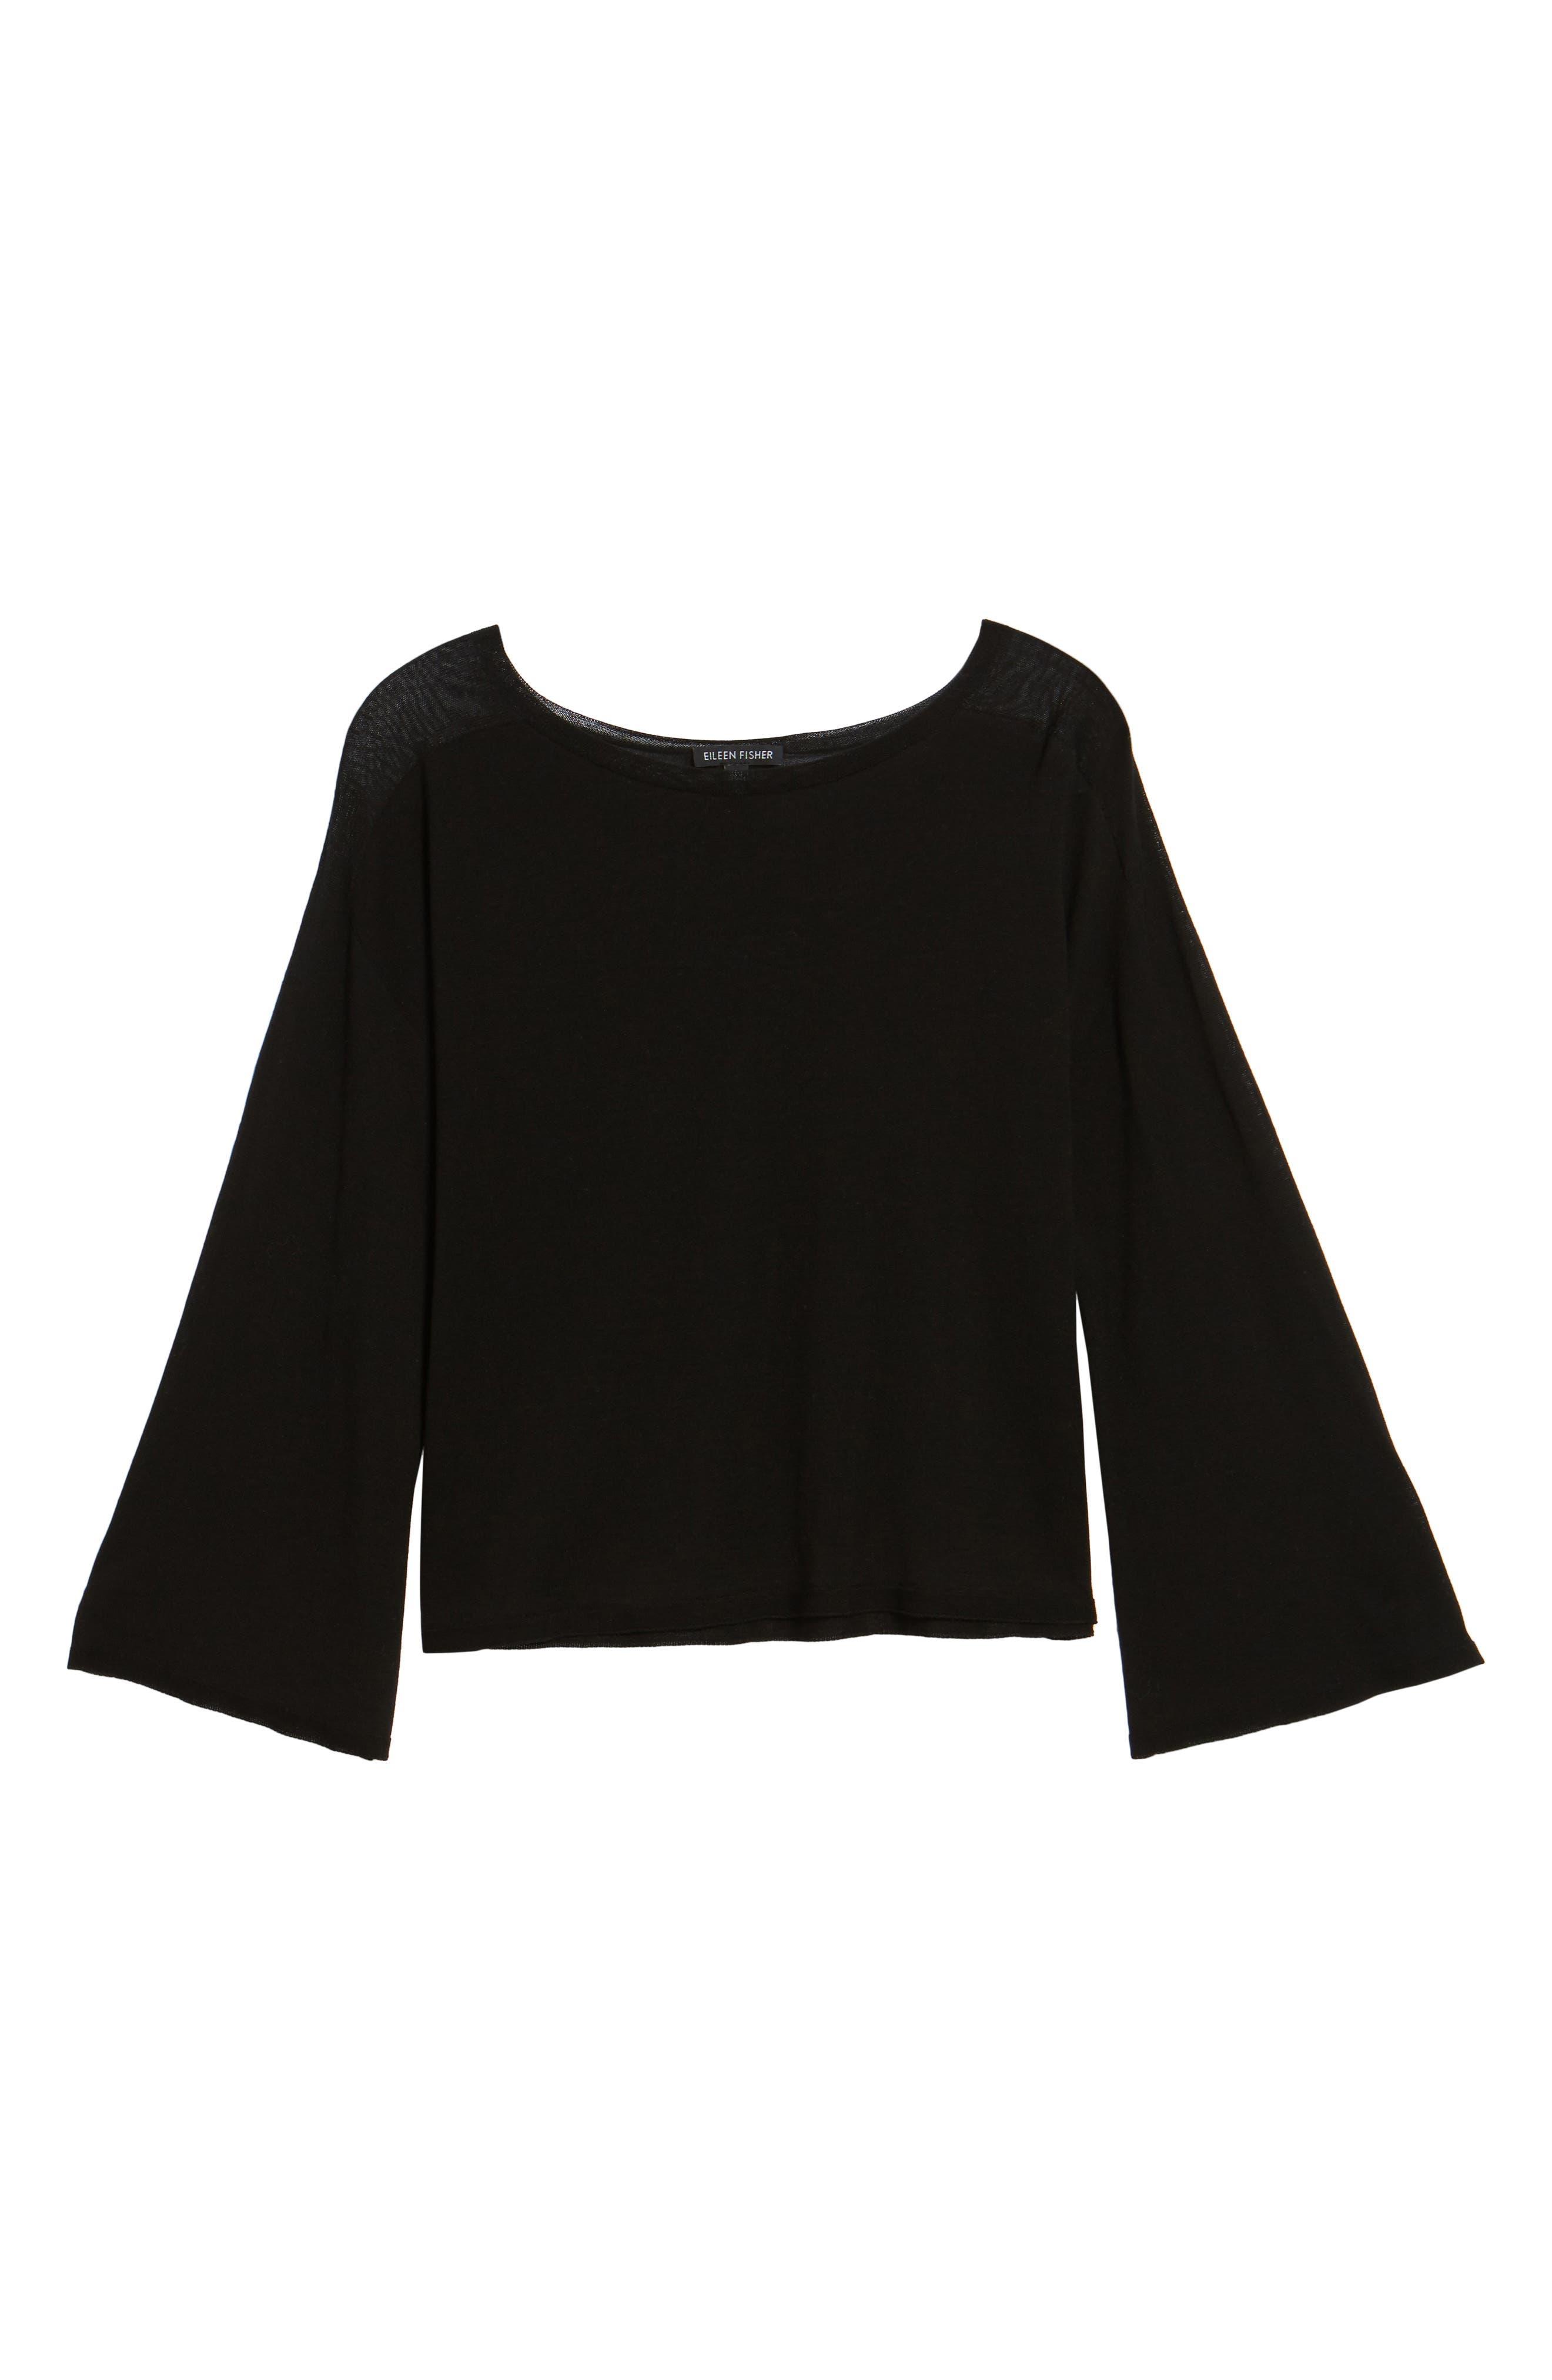 Tencel<sup>®</sup> Lyocell Knit Sweater,                             Alternate thumbnail 6, color,                             Black